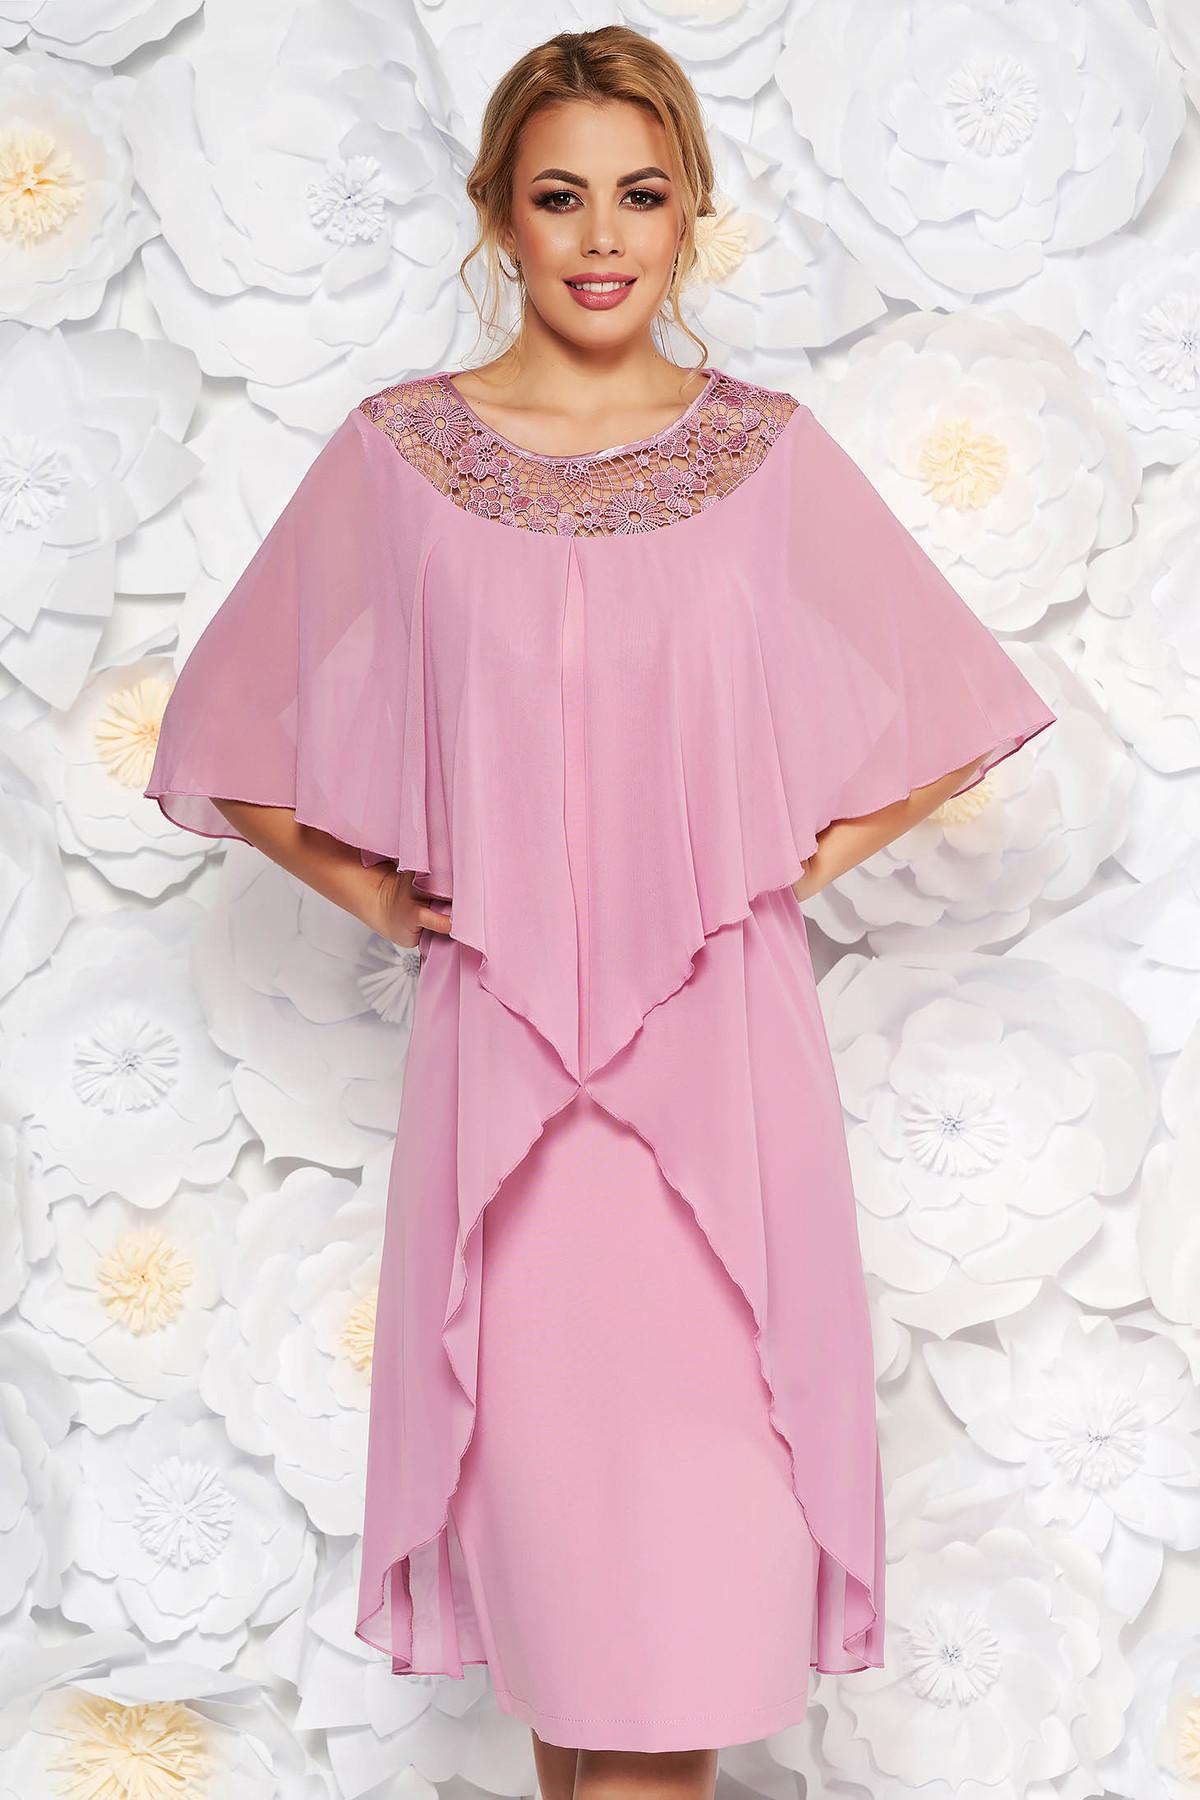 Rochie roz deschis de ocazie cu un croi drept din stofa usor elastica suprapunere cu voal